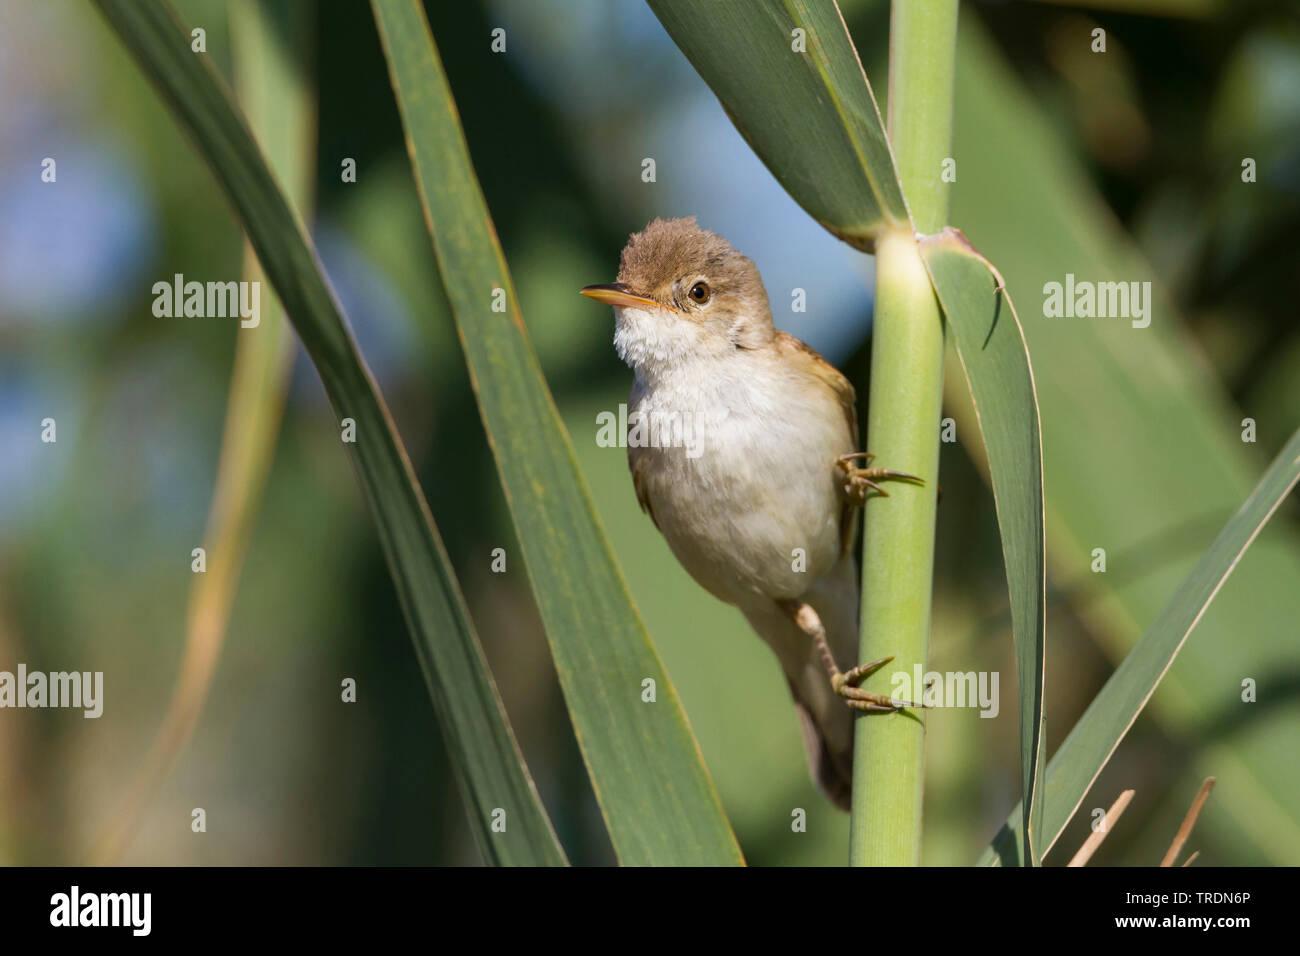 Eurasian Reed Warbler, Caspian Reed Warbler (Acrocephalus scirpaceus ssp. fuscus, Acrocephalus scirpaceus fuscus, Acrocephalus fuscus), perching at reed, Cyprus Stock Photo